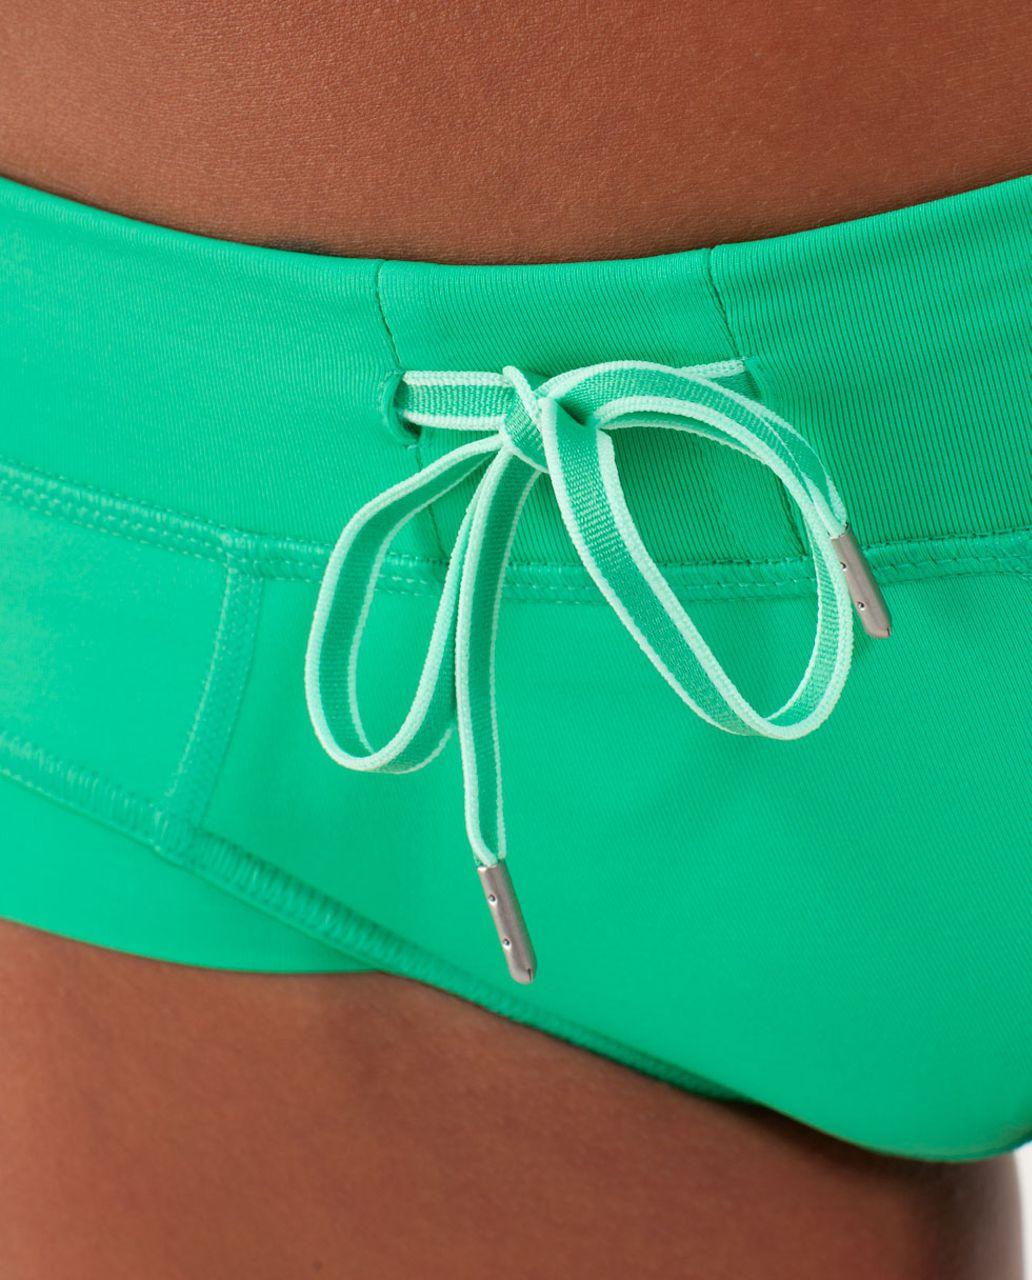 Lululemon Heat It Up Short - Very Green / Fresh Teal